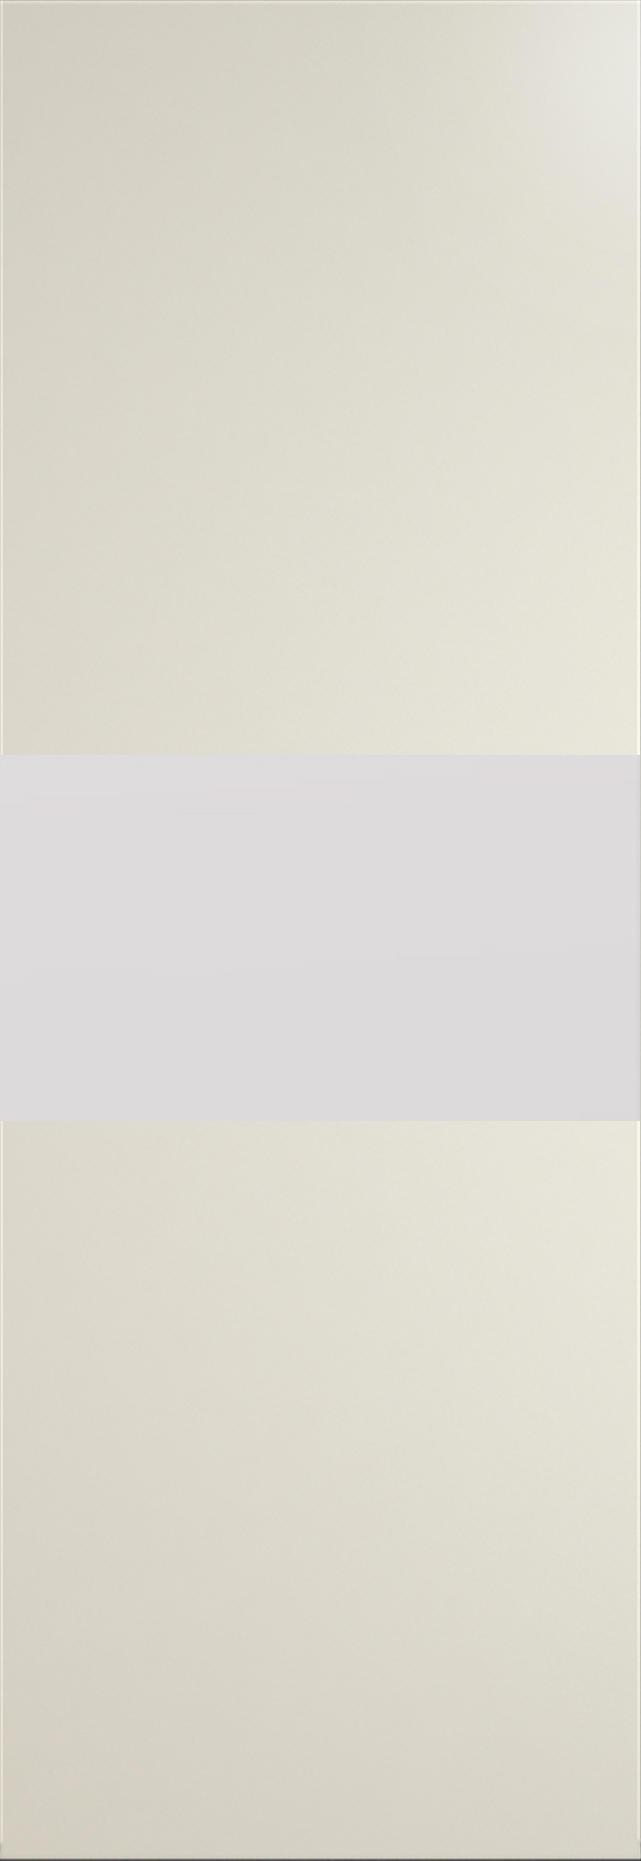 Tivoli Е-4 Invisible цвет - Жемчужная эмаль Без стекла (ДГ)